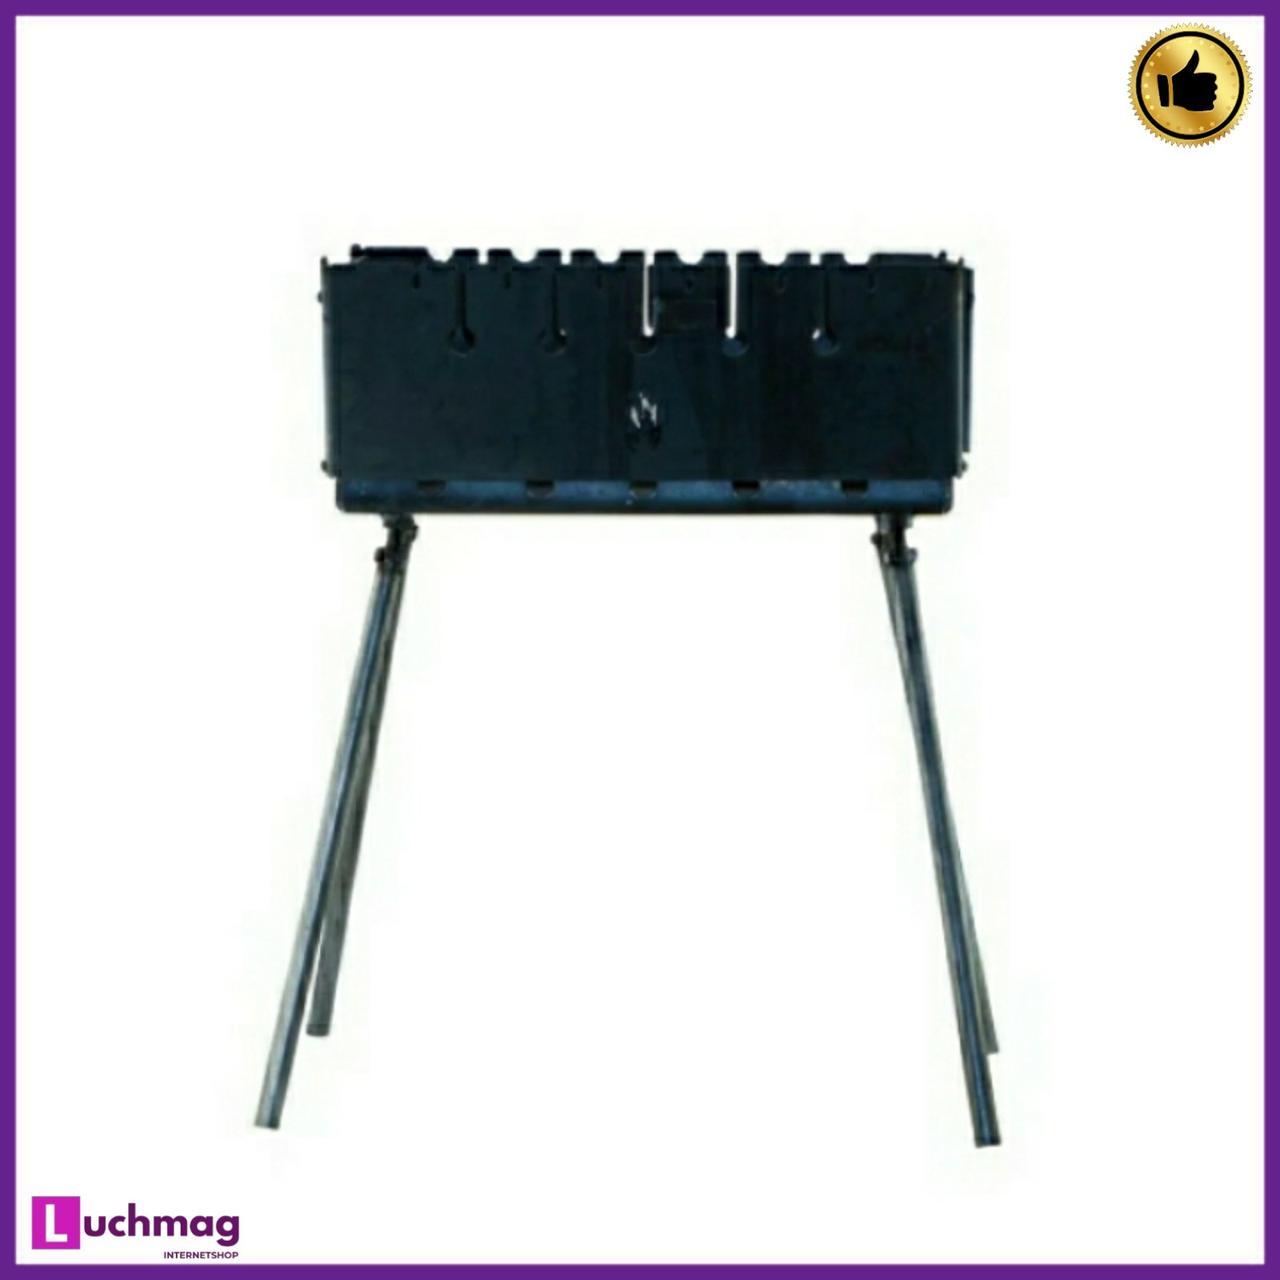 Мангал-чемодан на 10 шампуров (горячекатаный) толщина металла 2 мм